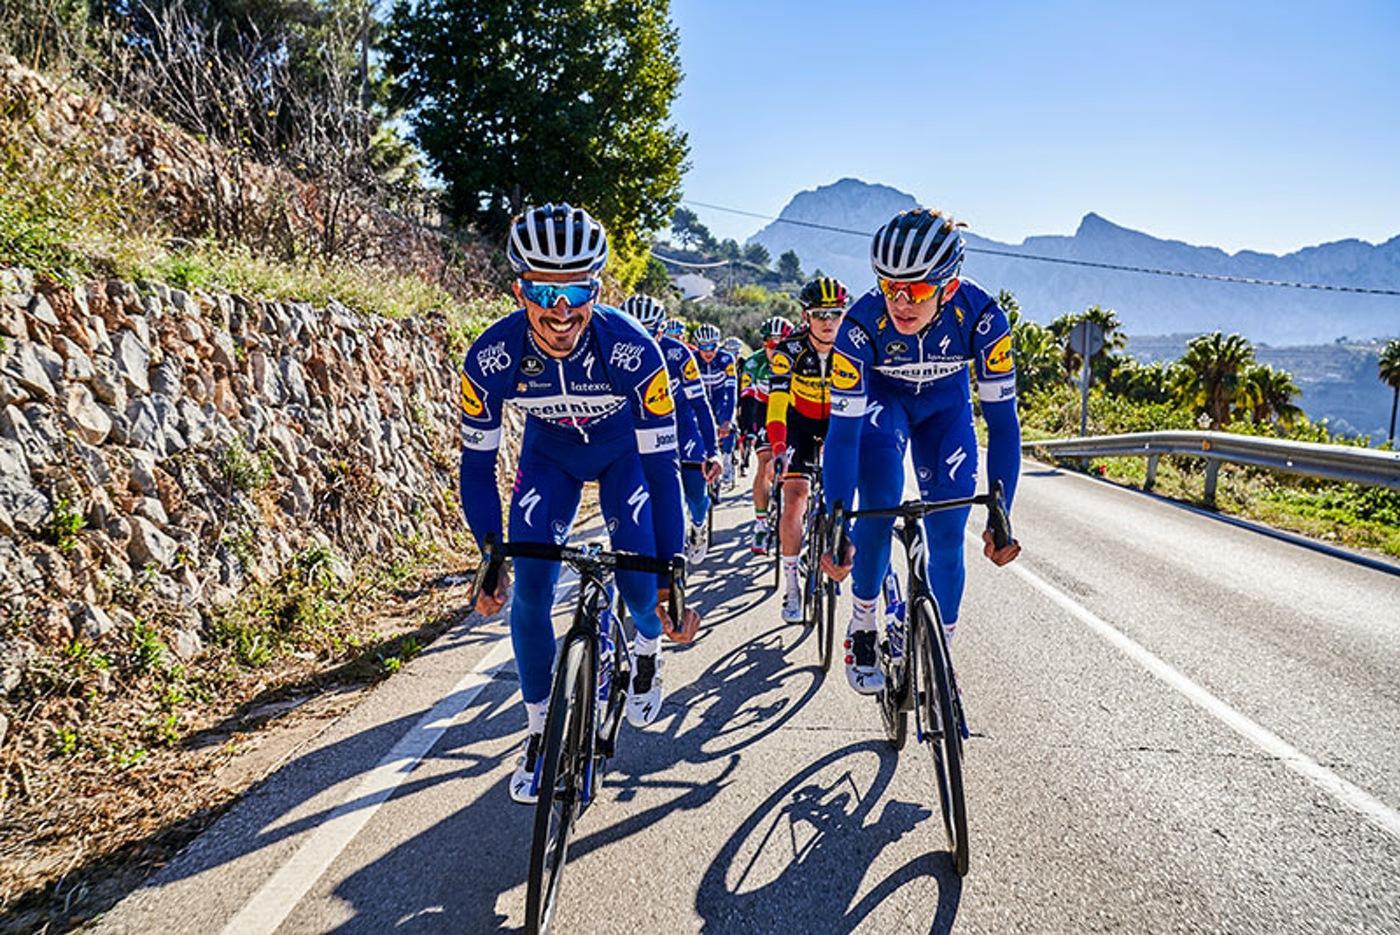 Bryton equipará al equipo Deceuninck - Quick-Step